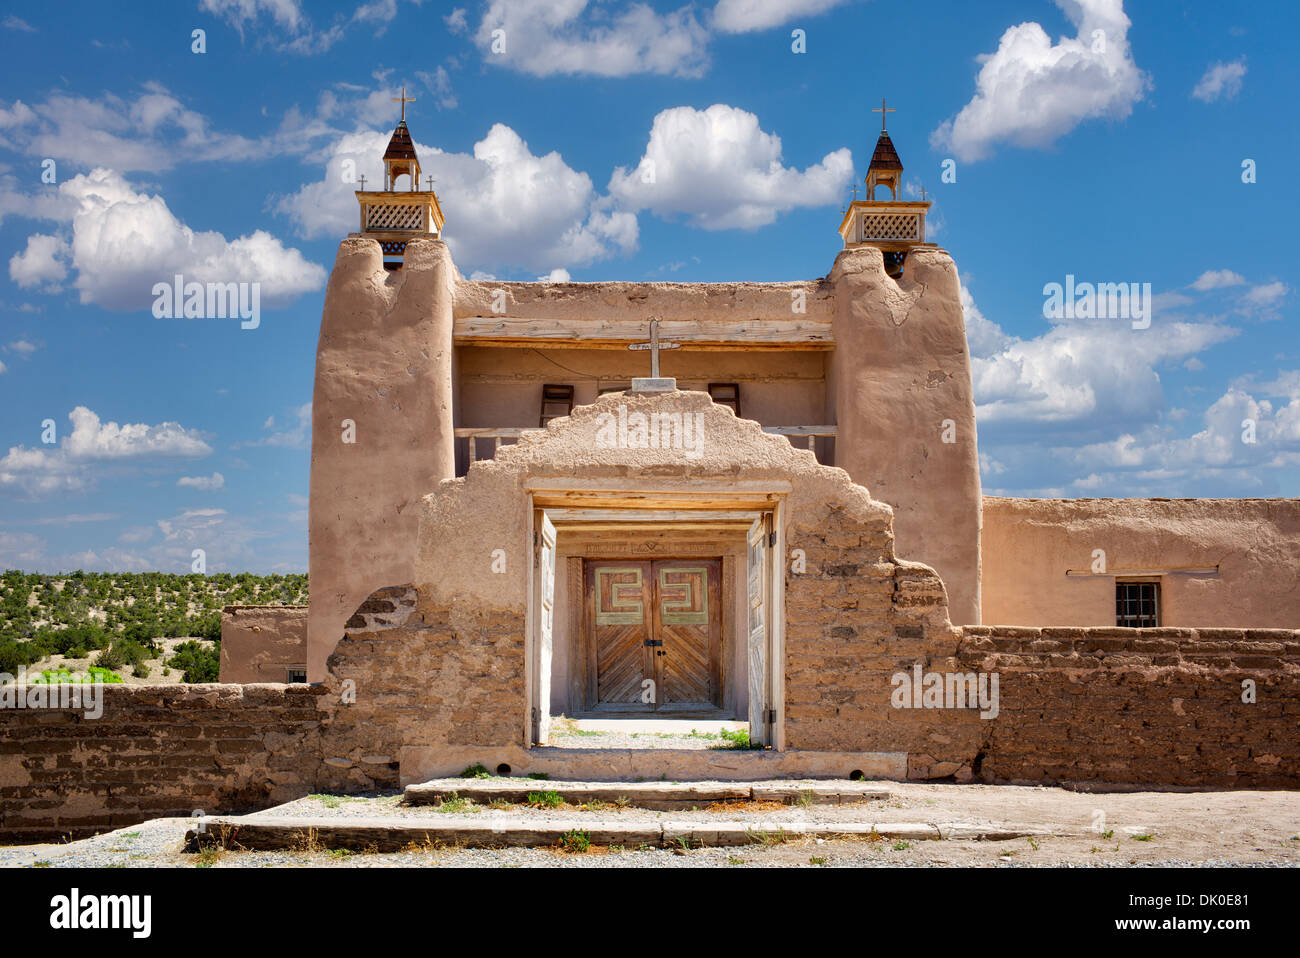 San José de gracia de la Iglesia Católica. Nuevo México Imagen De Stock